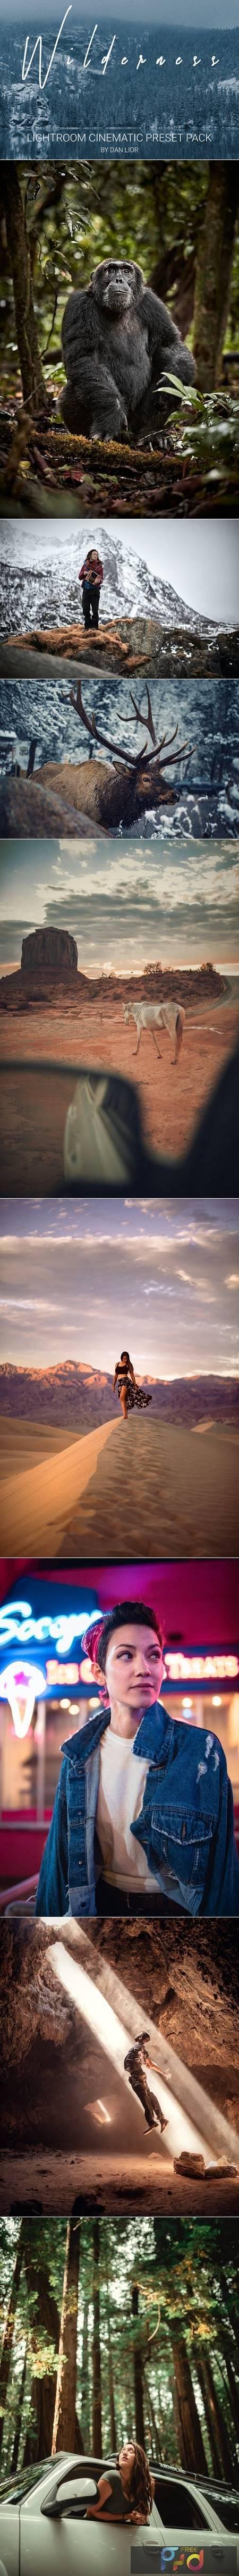 WILDRENESS -- Cinematic Preset Pack 4570533 1